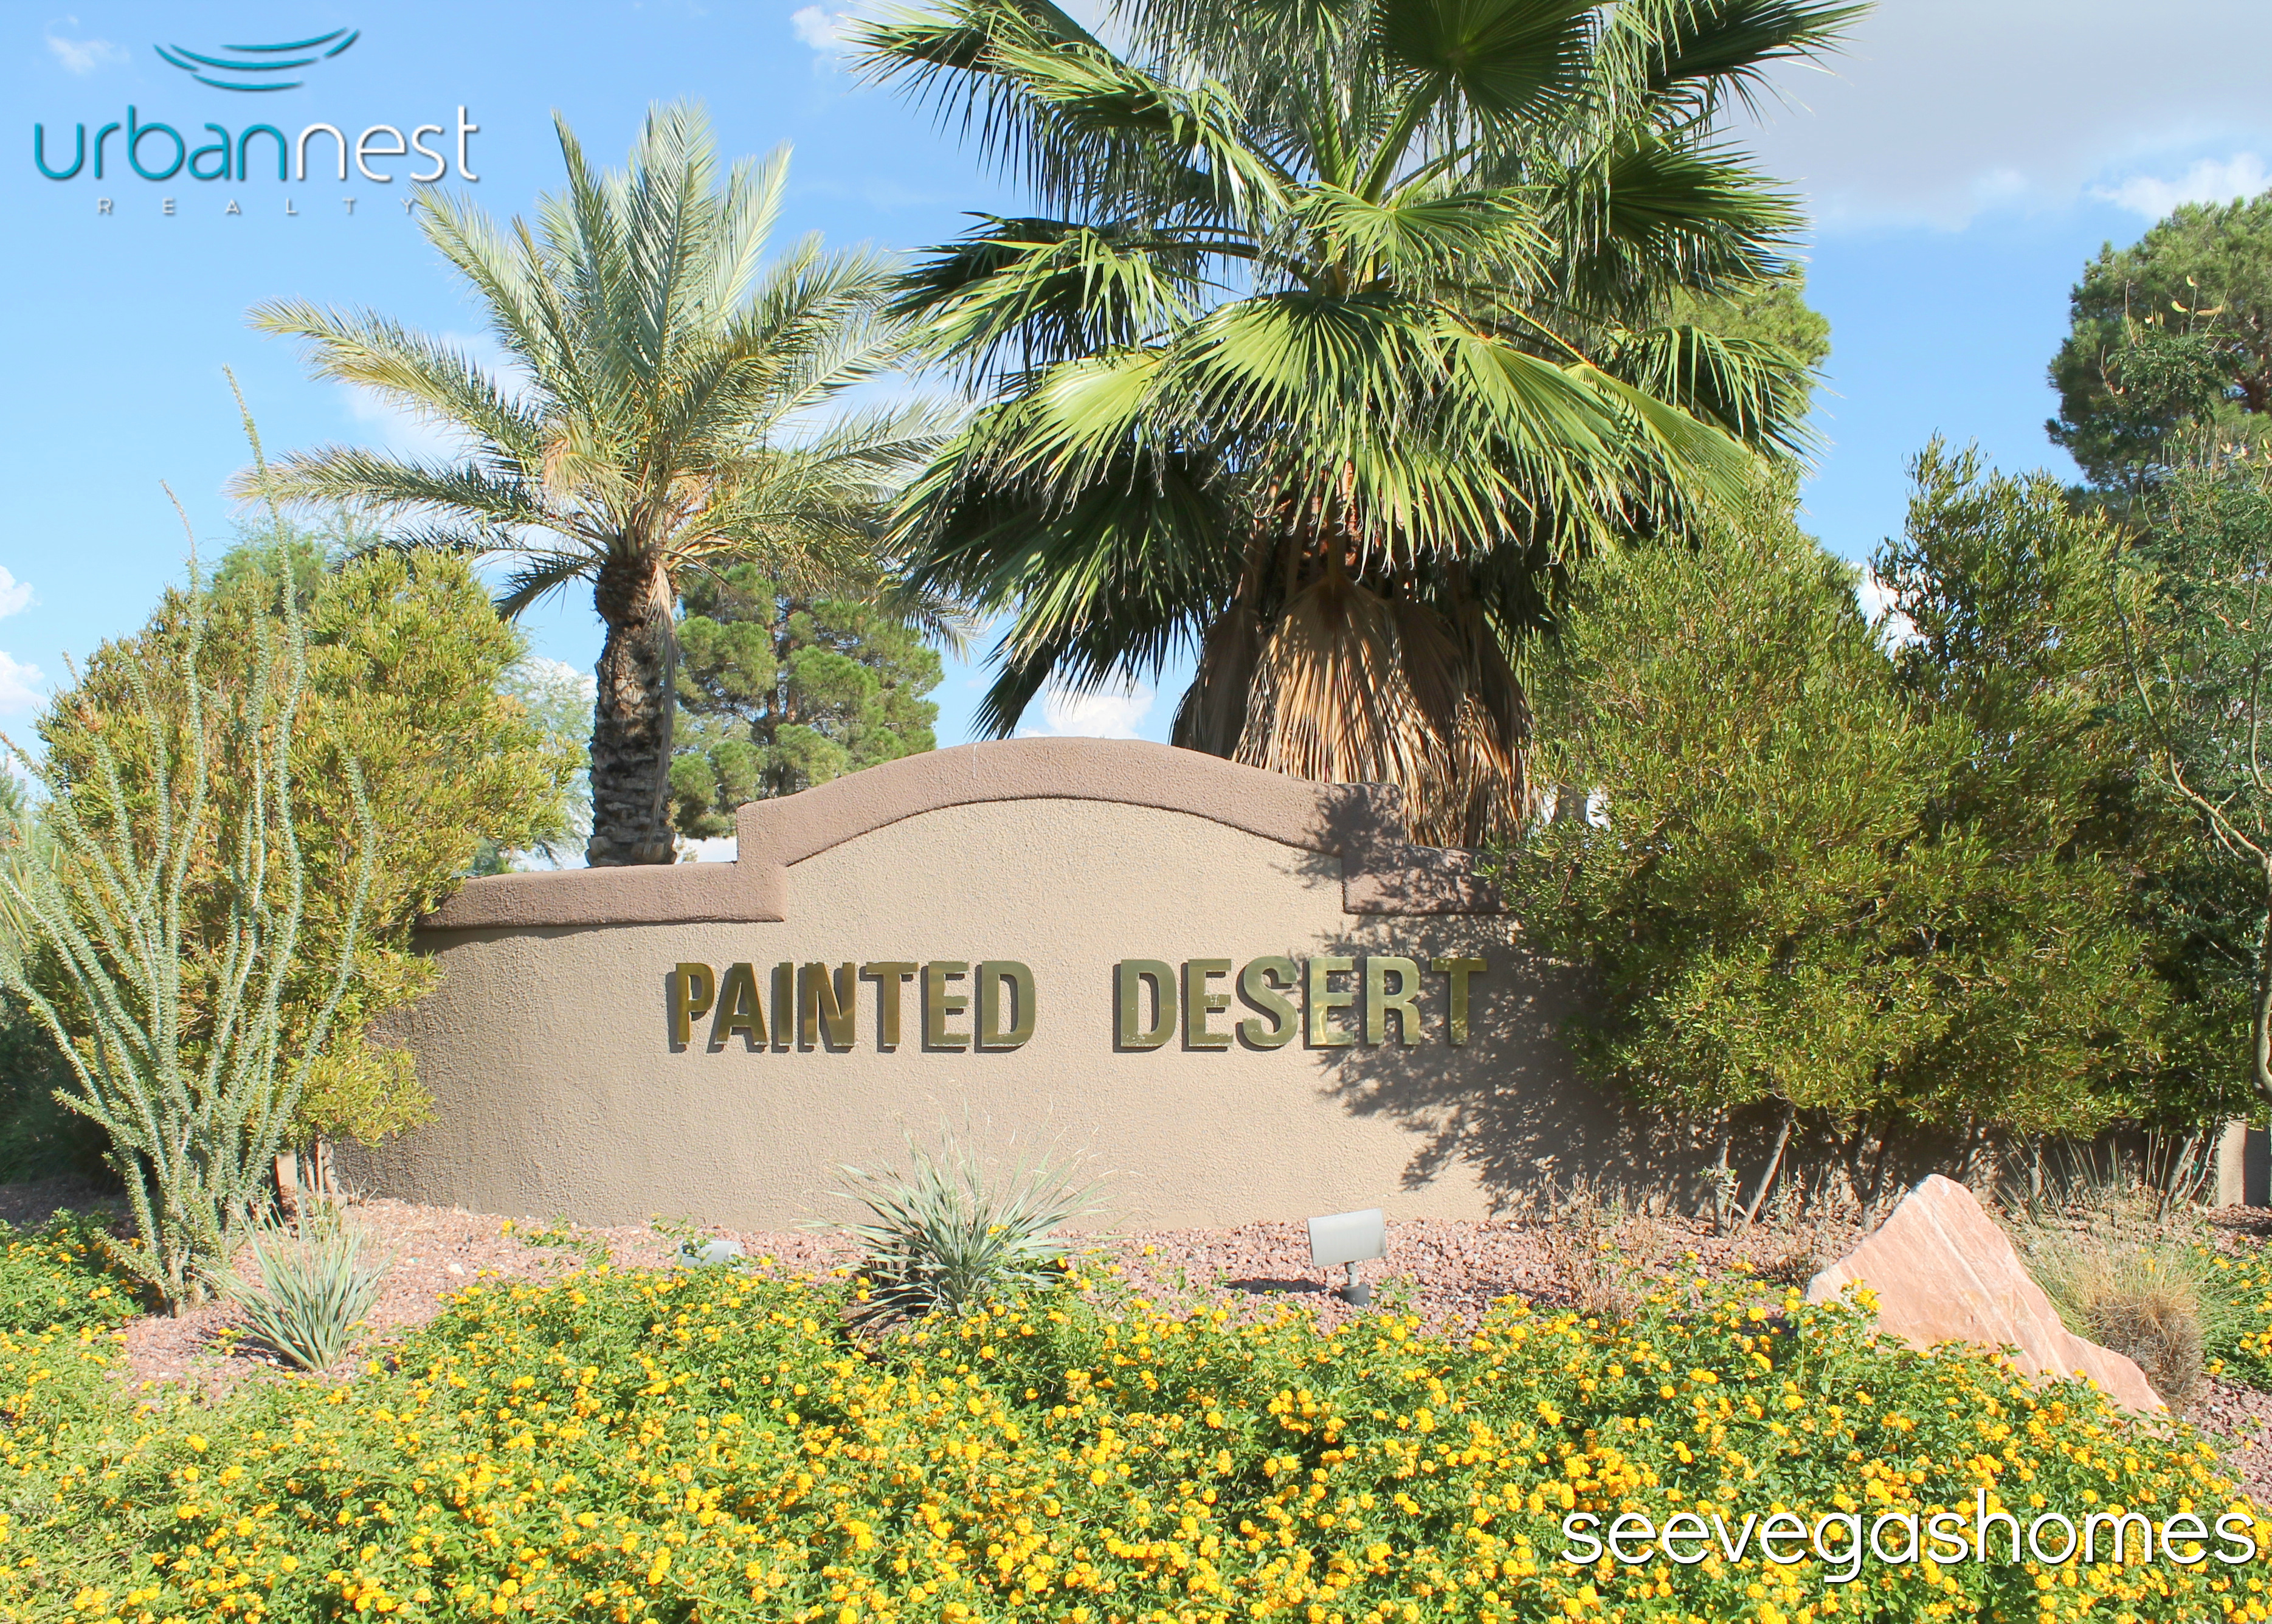 Painted Desert Las Vegas NV 89149 SeeVegasHomes